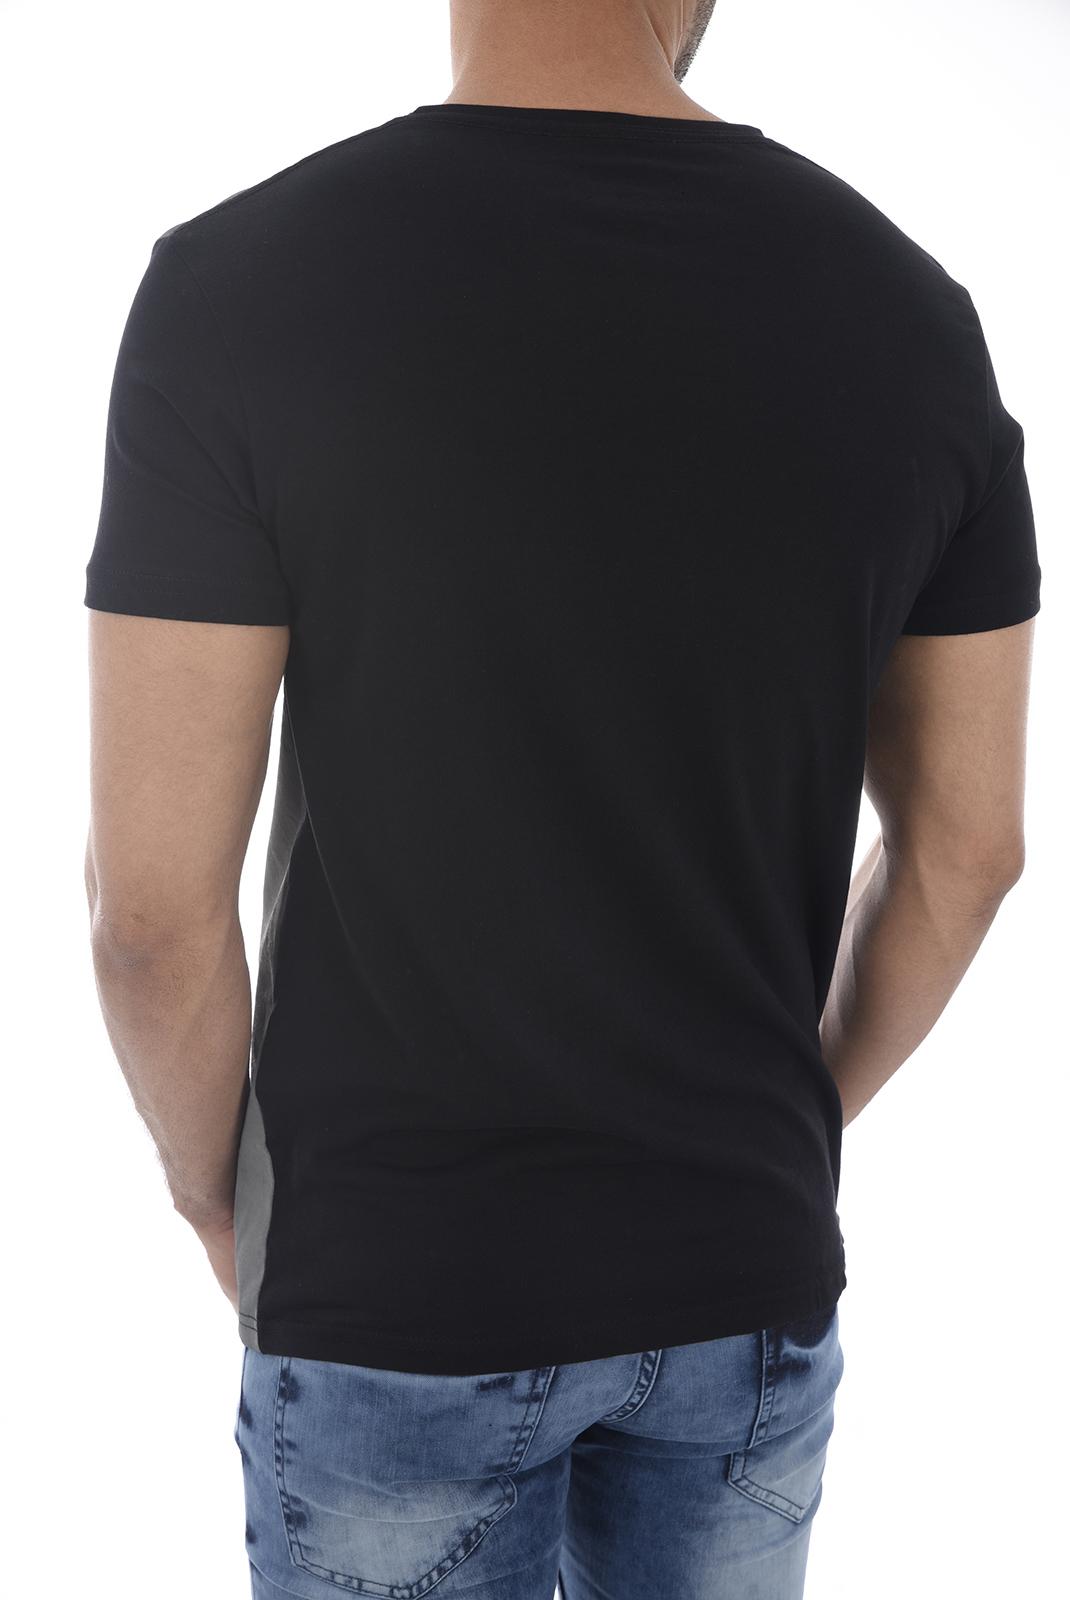 Tee-shirts  V1969 by Versace 1969 FORLI NOIR